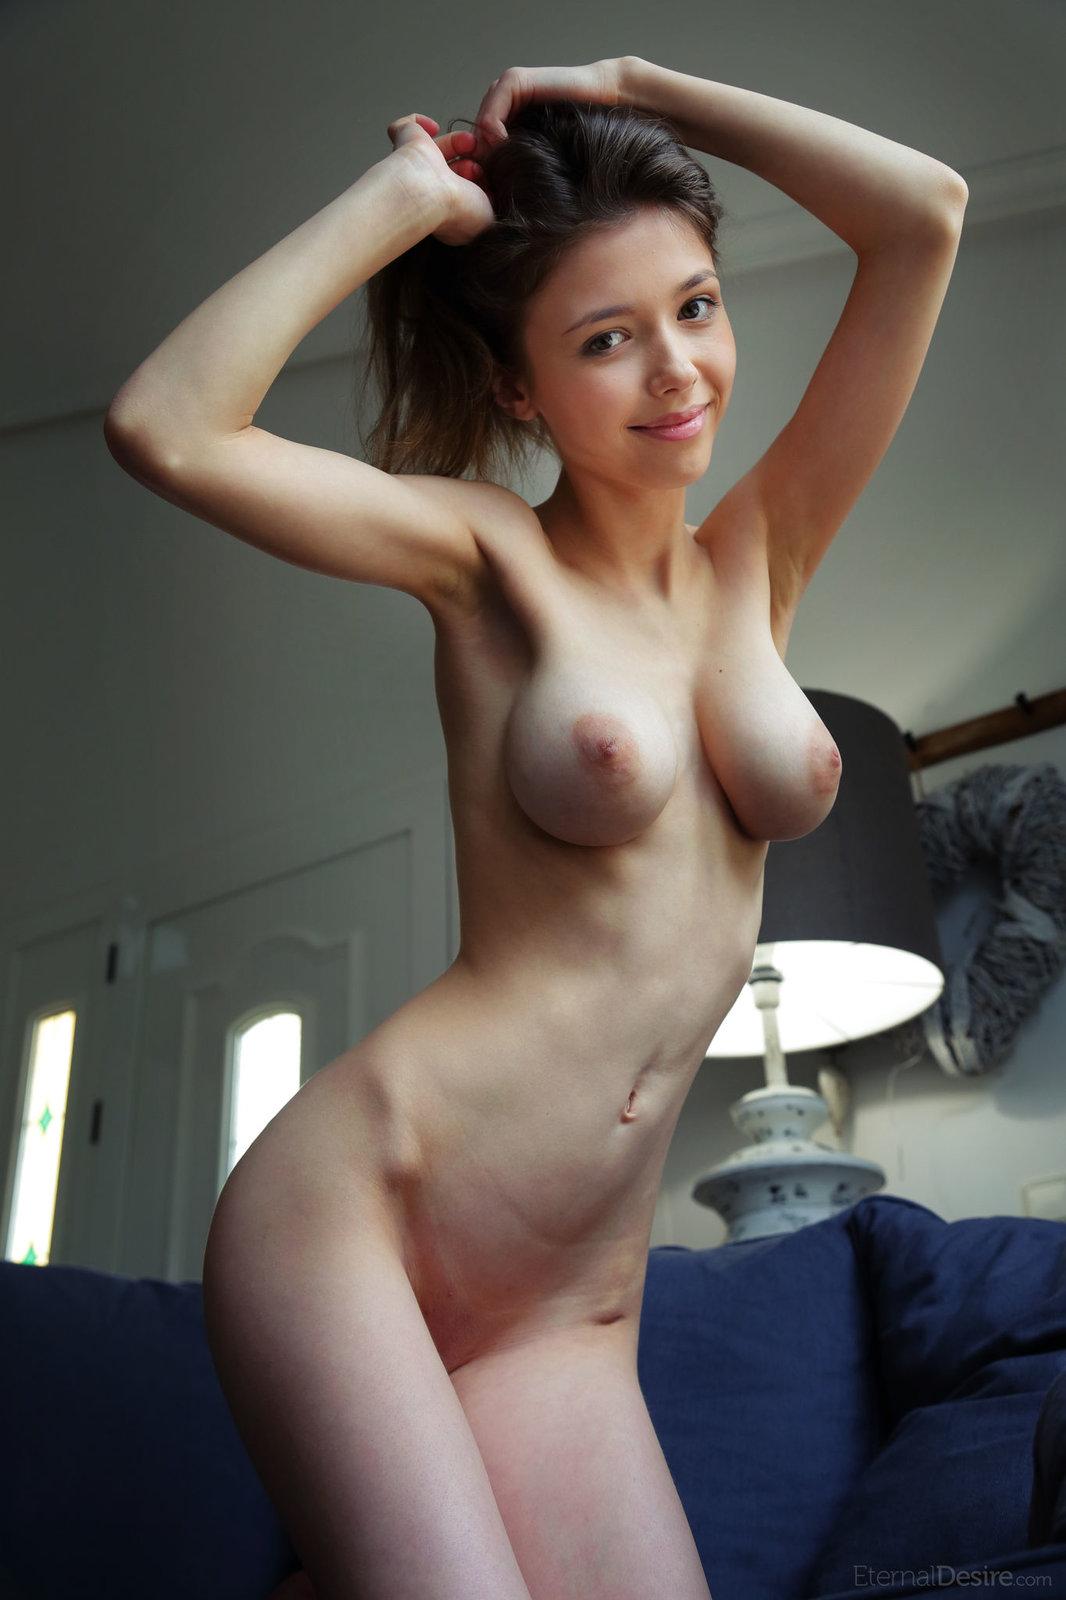 Milla In Vole By Eternal Desire 16 Photos  Erotic Beauties-8398